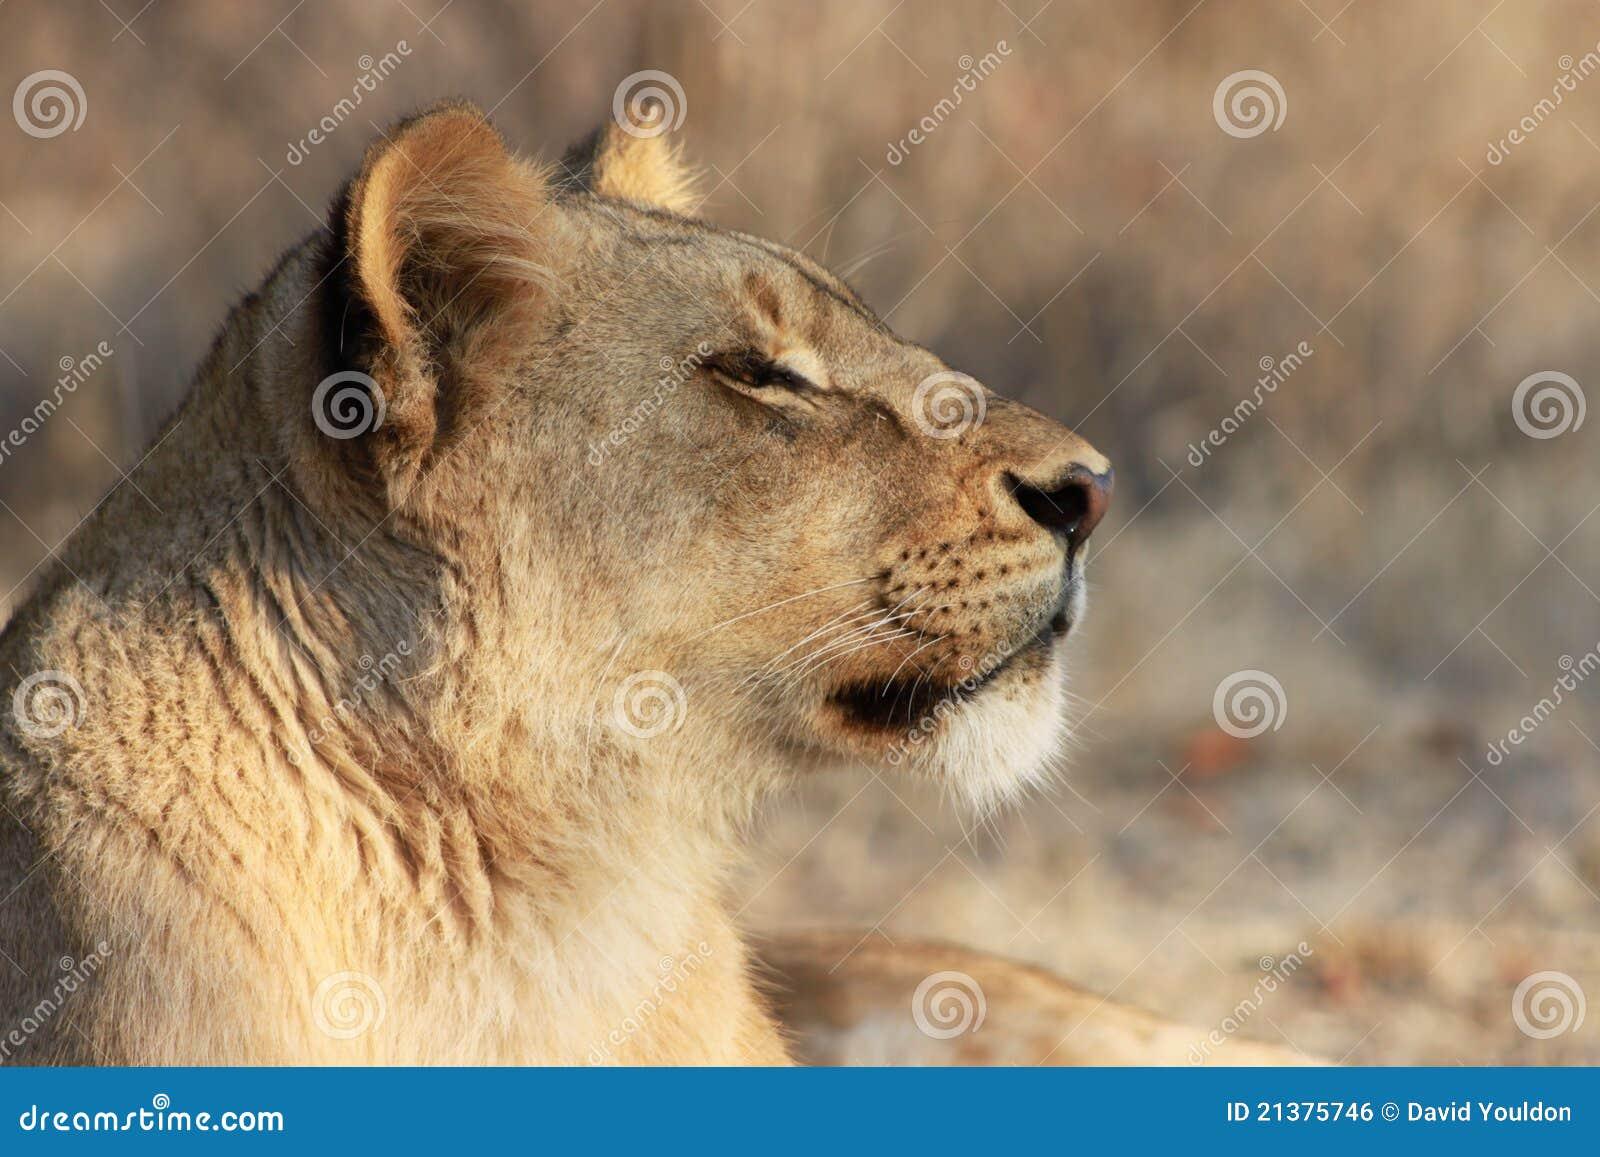 Lion Side Profile Lion-profile-21375746.jpg